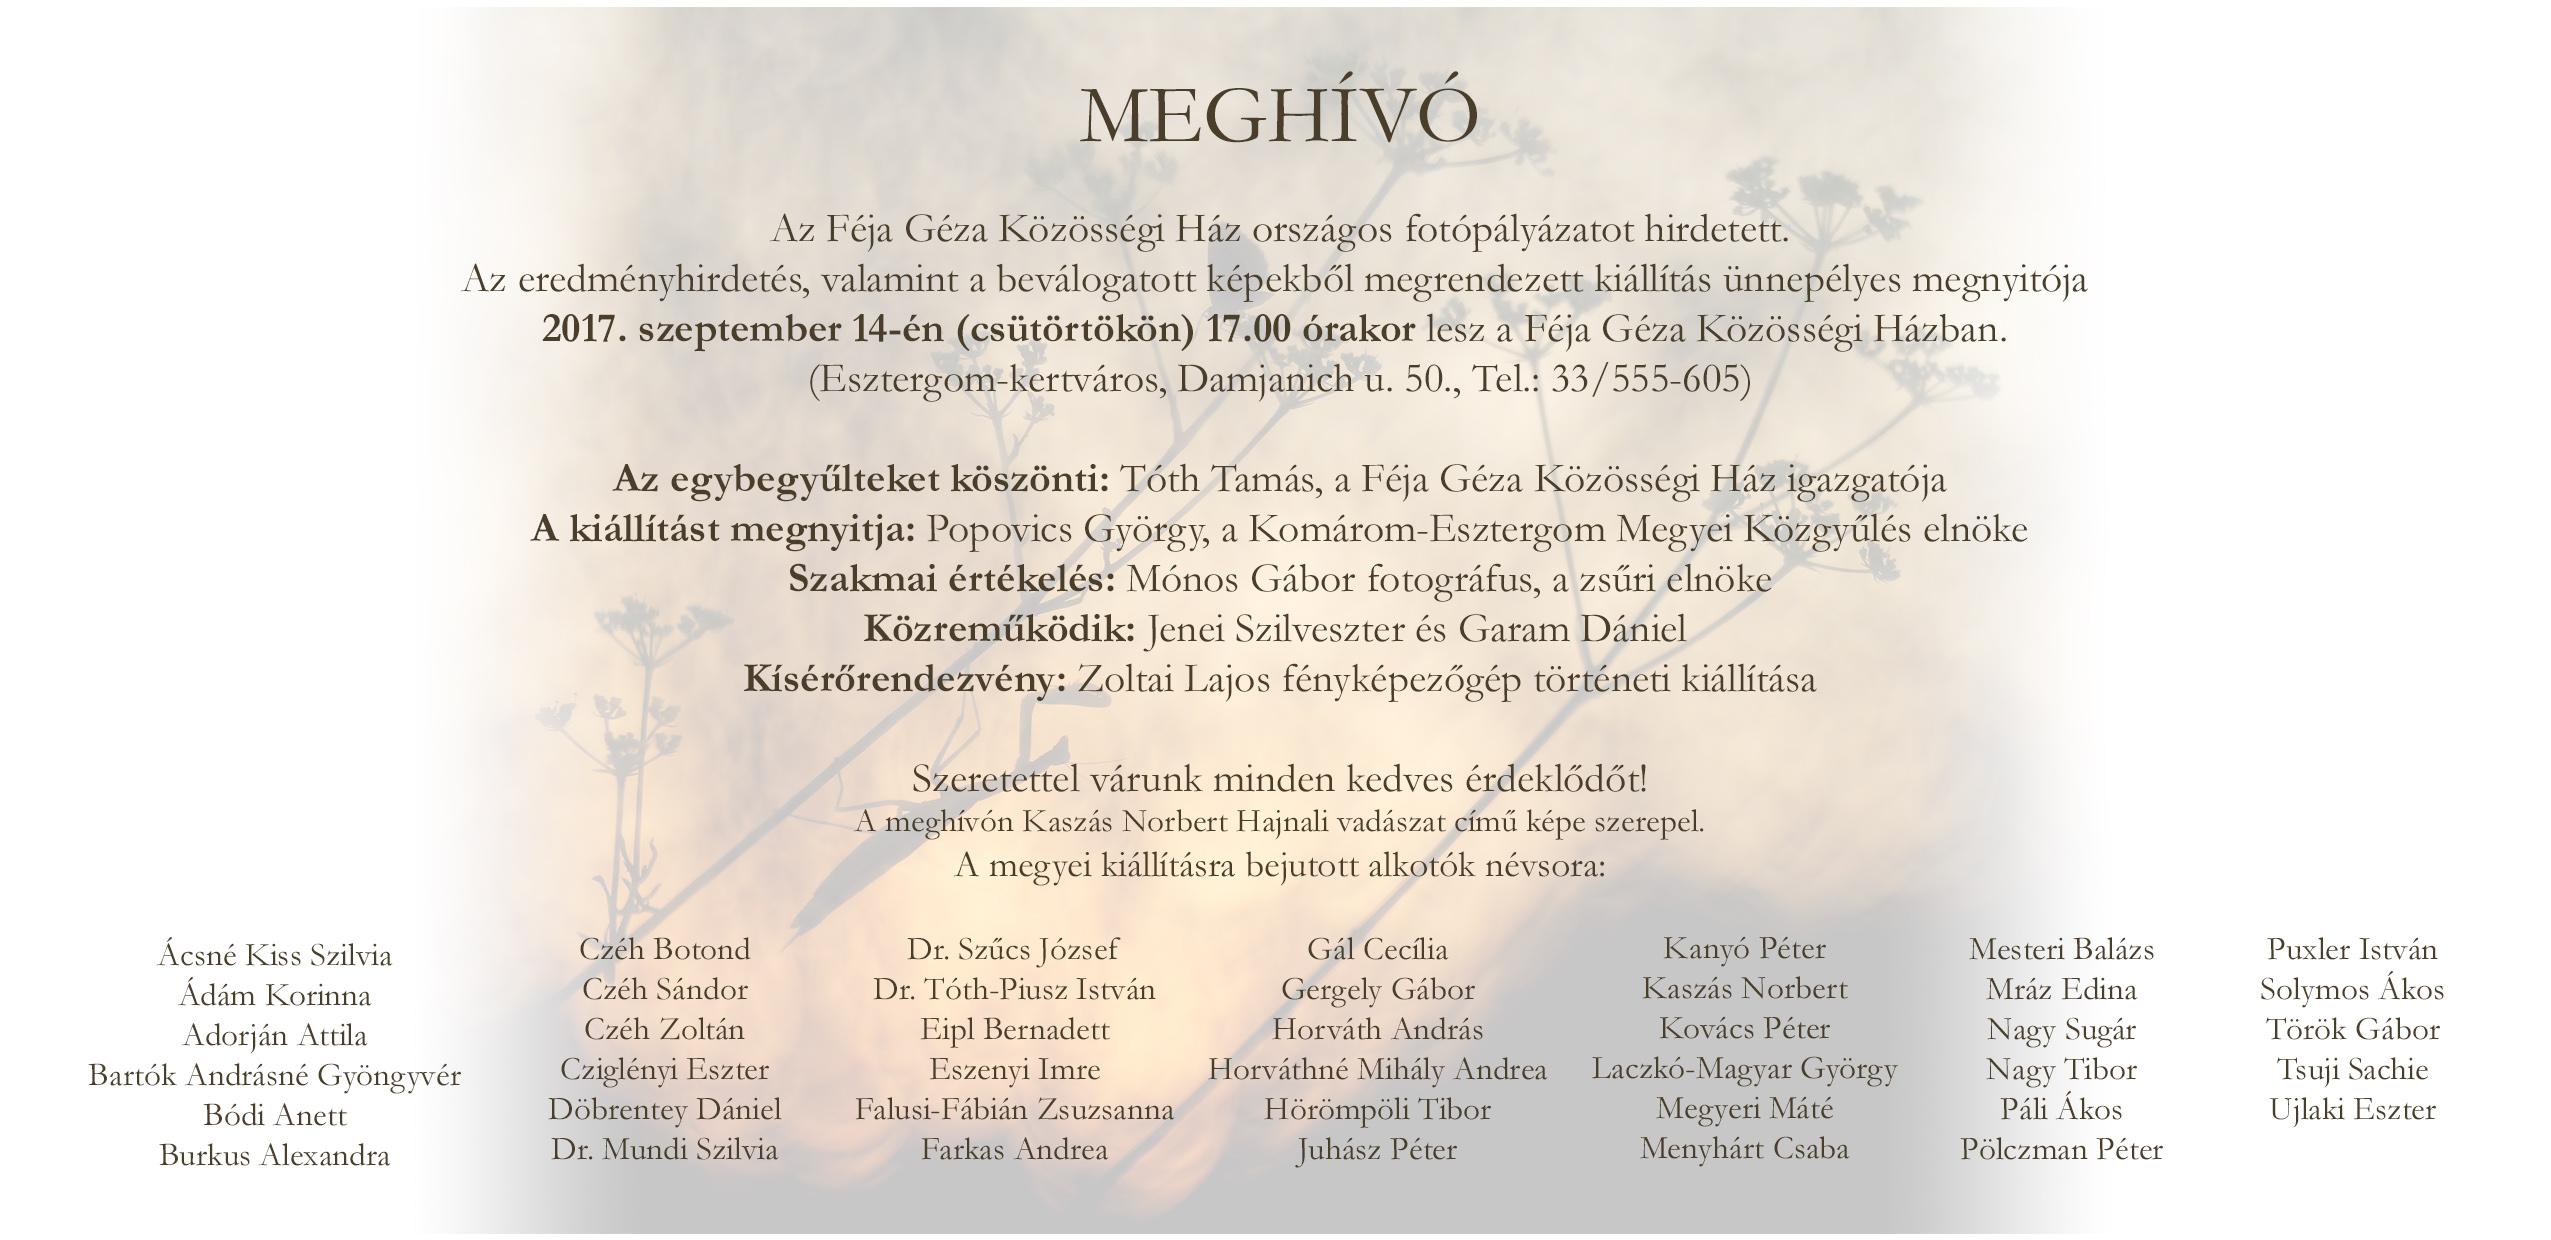 meghivo02.jpg